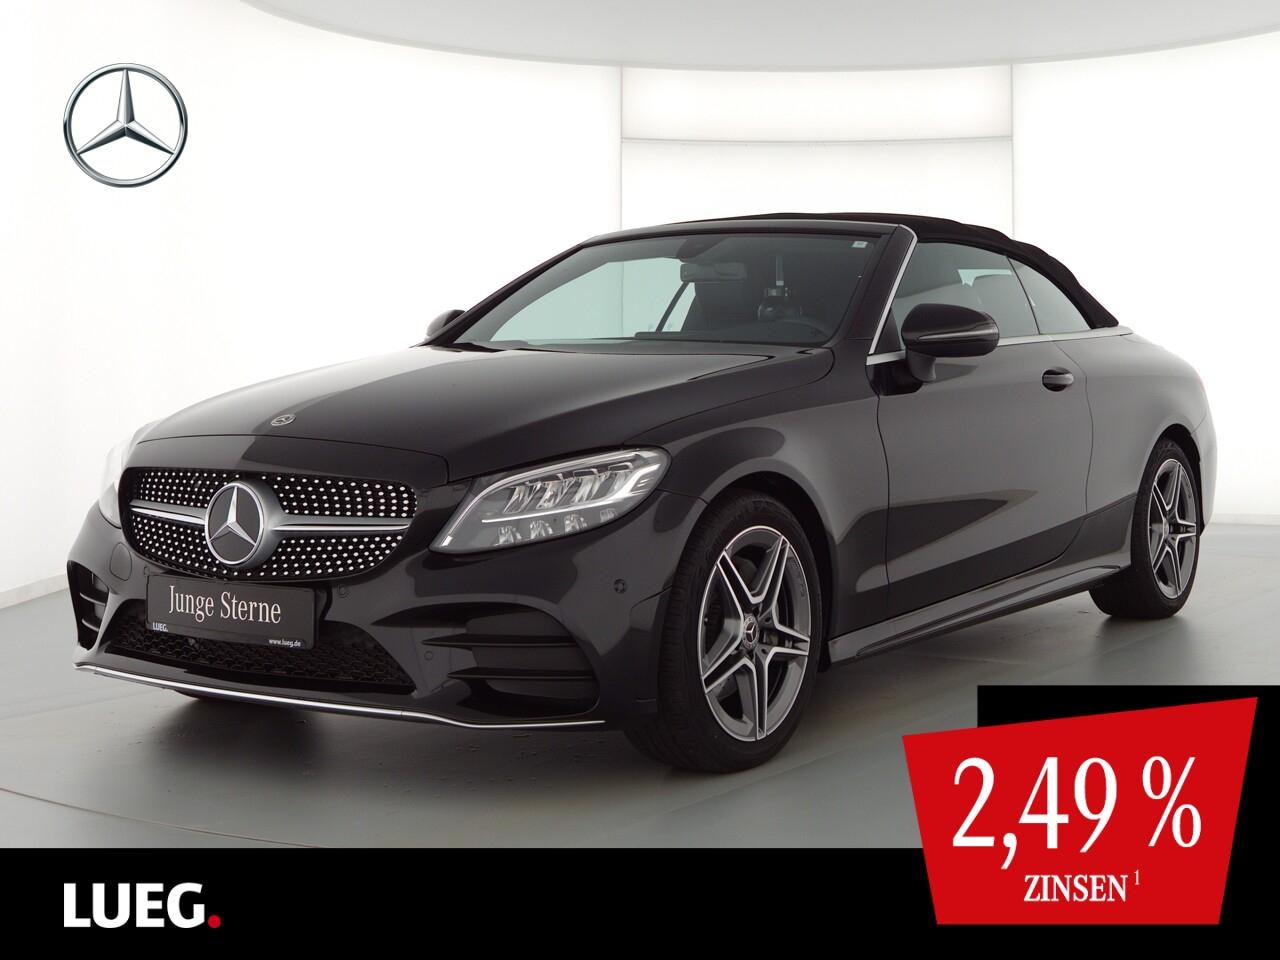 Mercedes-Benz C 180 Cabrio AMG+Navi+LED-HP+CabKom+ParkA+Kamera, Jahr 2020, Benzin